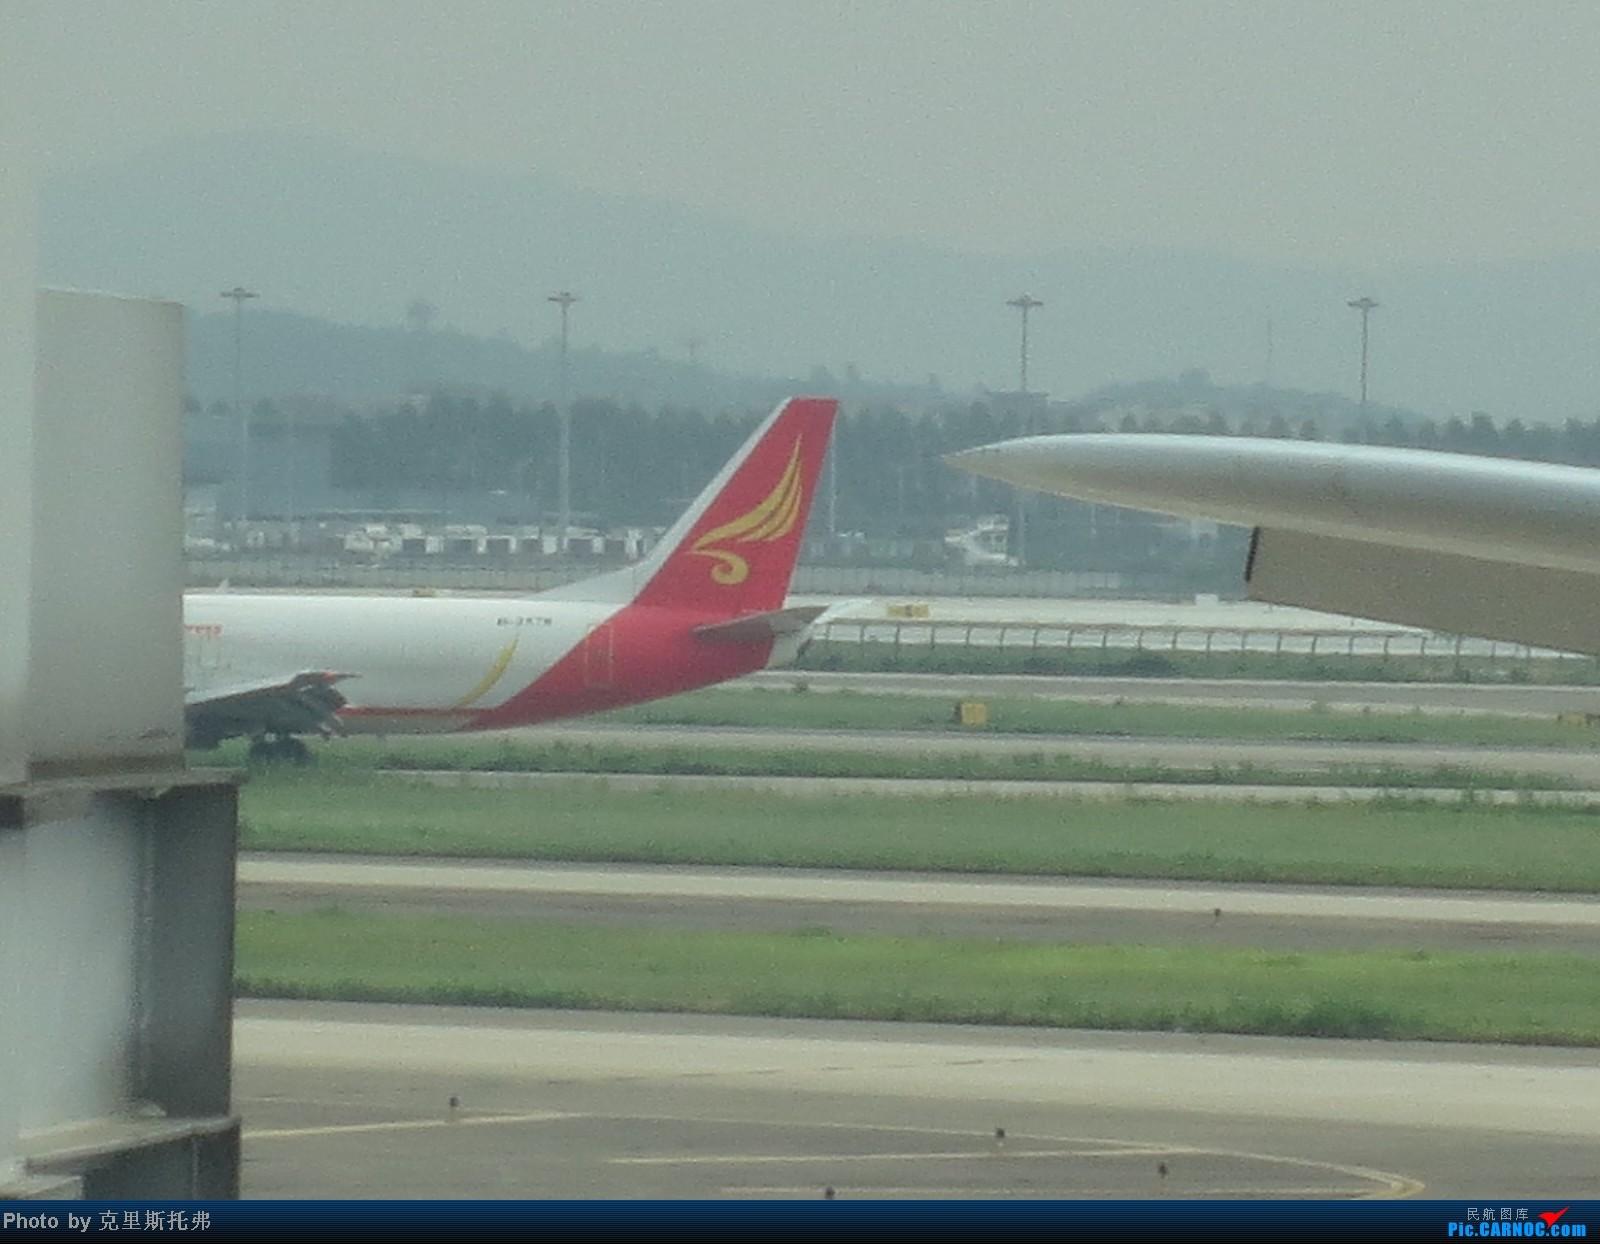 Re:[原创]【广州,你好!】八月齐鲁行 第一集 {初到齐鲁城} 不期而遇,鹏程行万里 相伴相惜,享飞行至美 737F